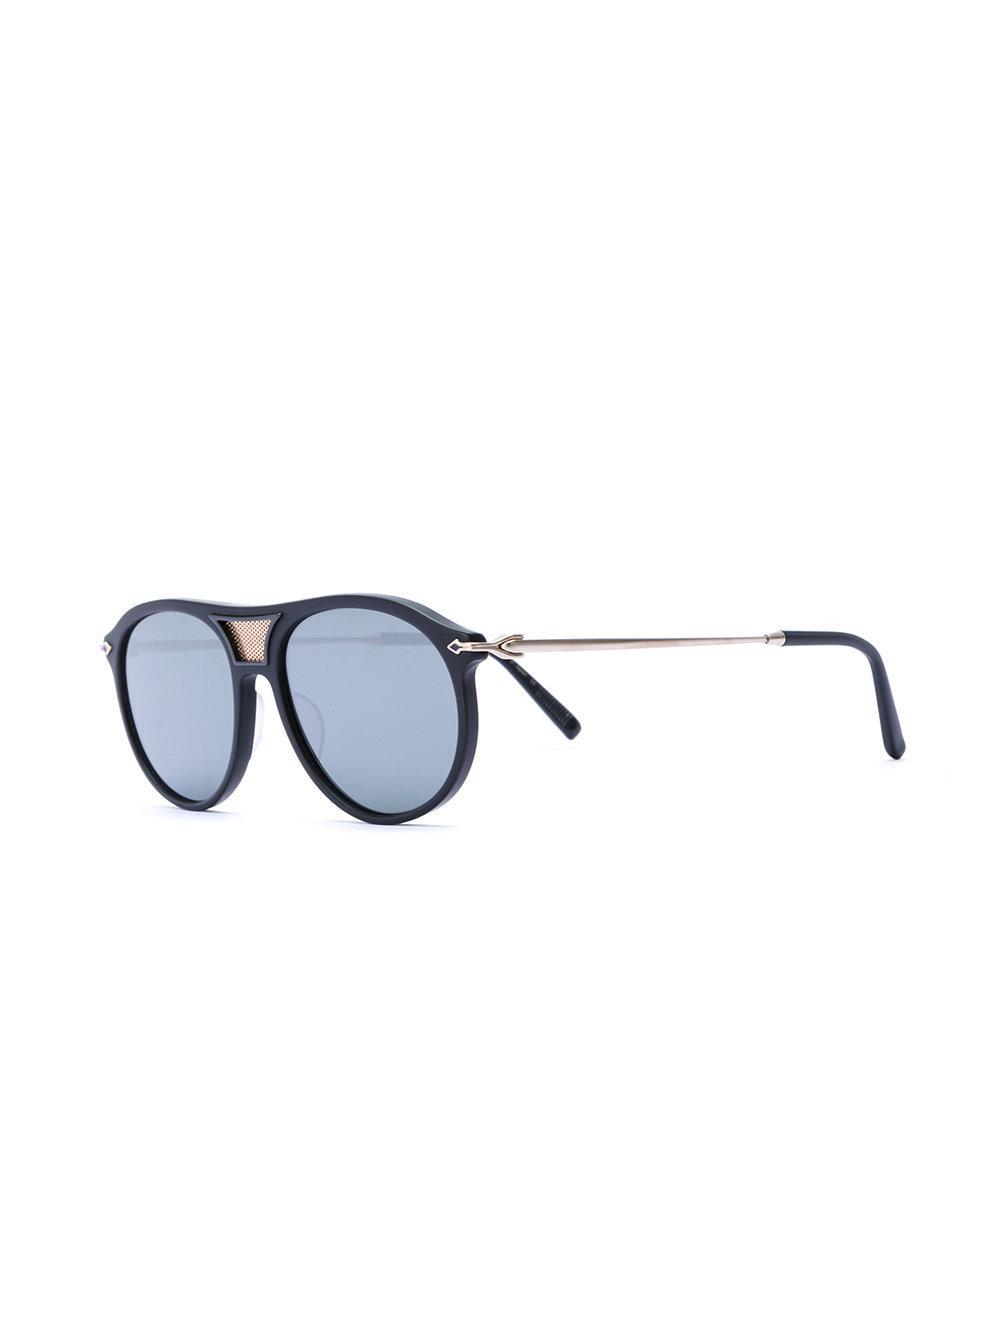 001c5be003168 matsuda-Black-Aviator-Sunglasses-With -Detachable-Leather-Side-Shield-Clip.jpeg